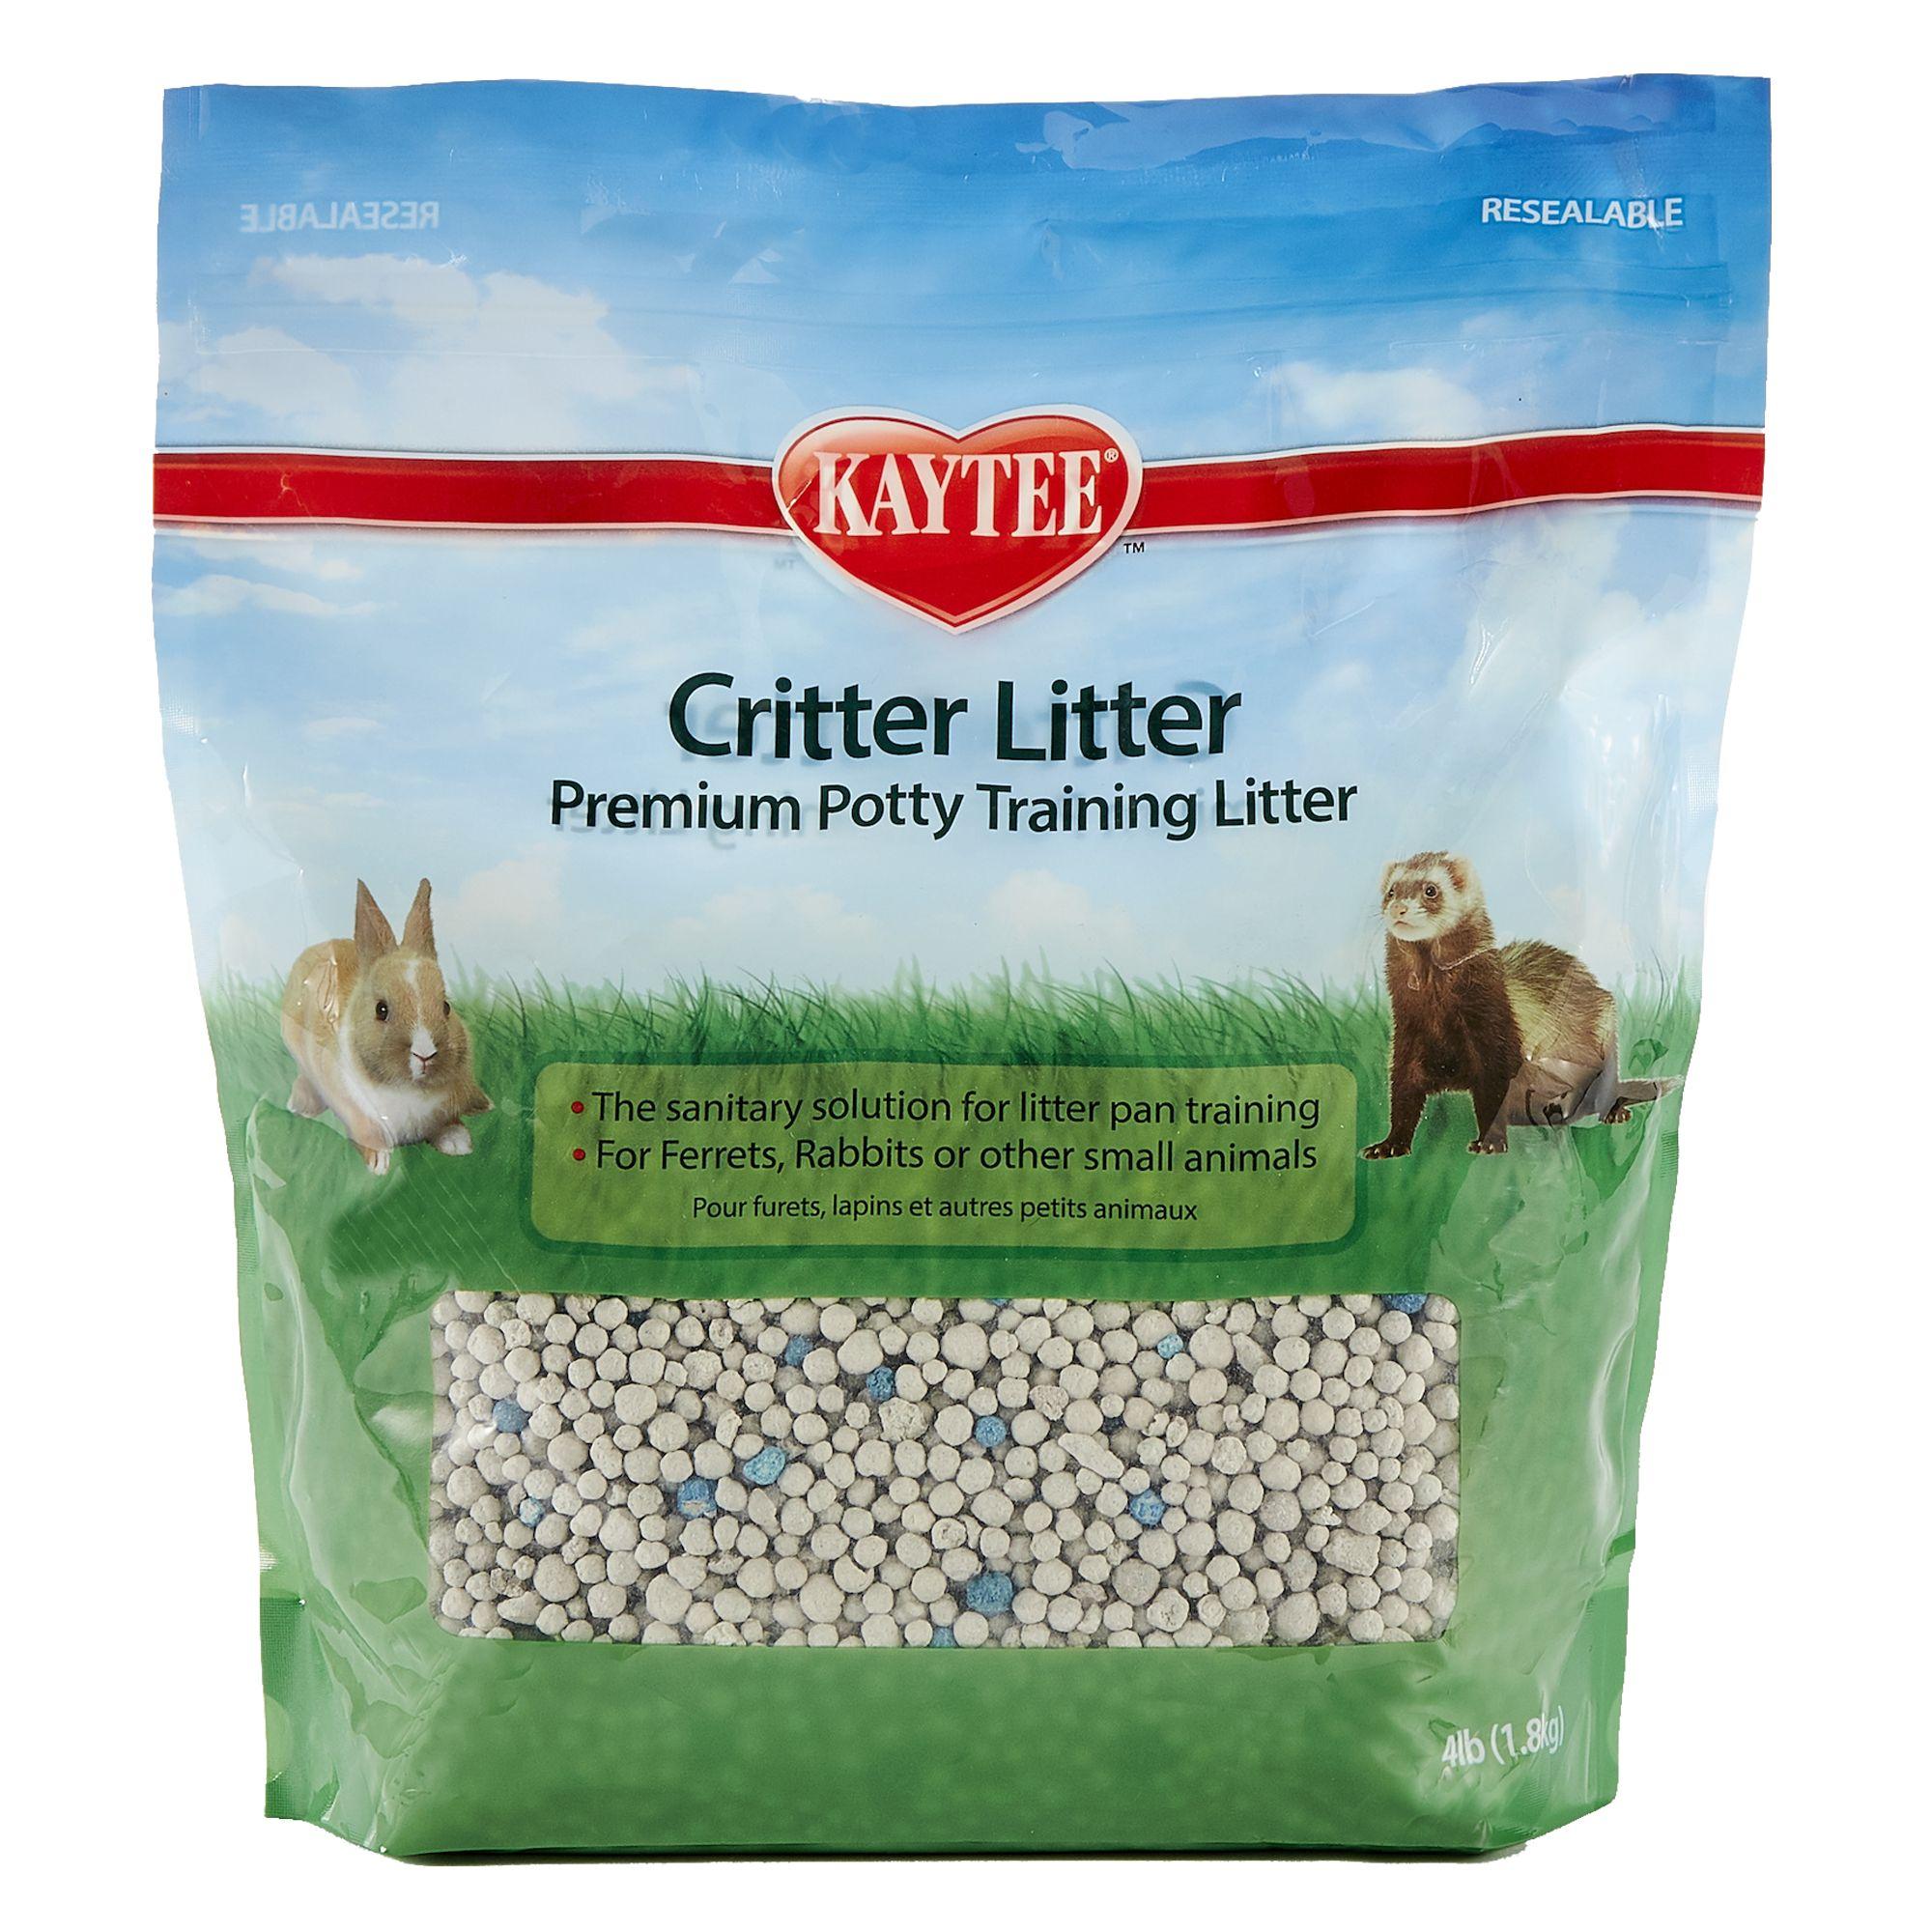 Kaytee Critter Litter Premium Potty Small Pet Training Litter Small Pet Litter Bedding Petsmart